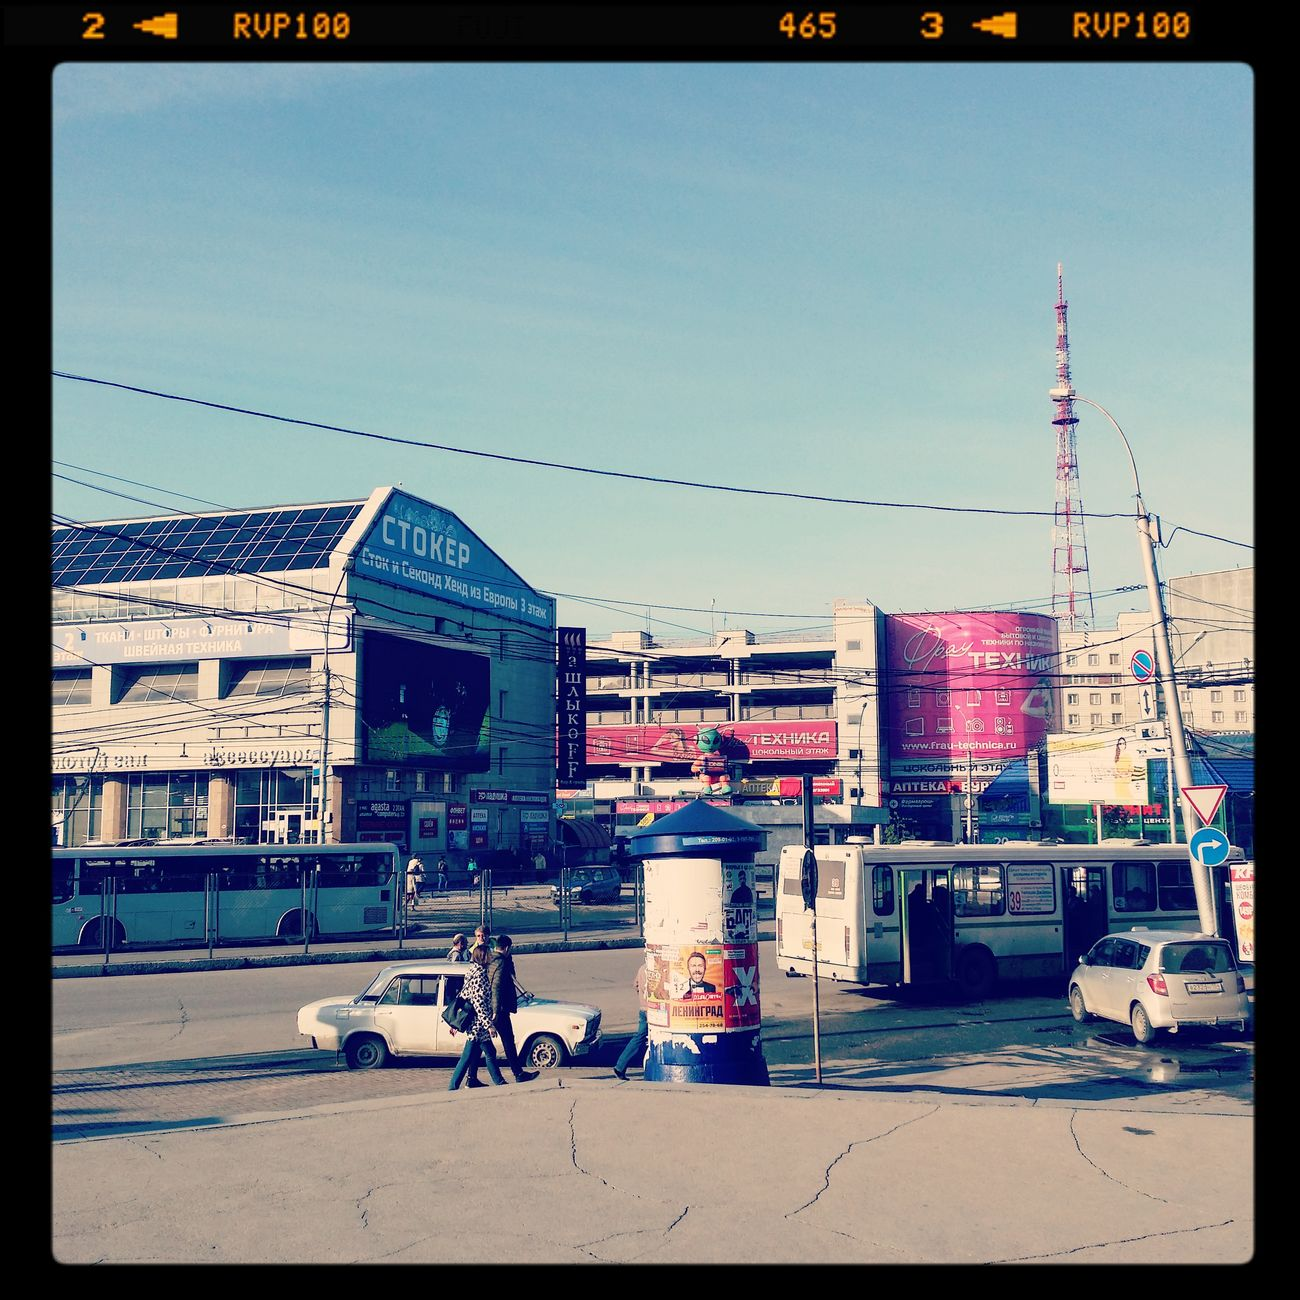 Новосибирск. Утро Streetphotography Street Photography Siberia улица Новосибирск Novosibirsk сибирь Novosibirsk City утро